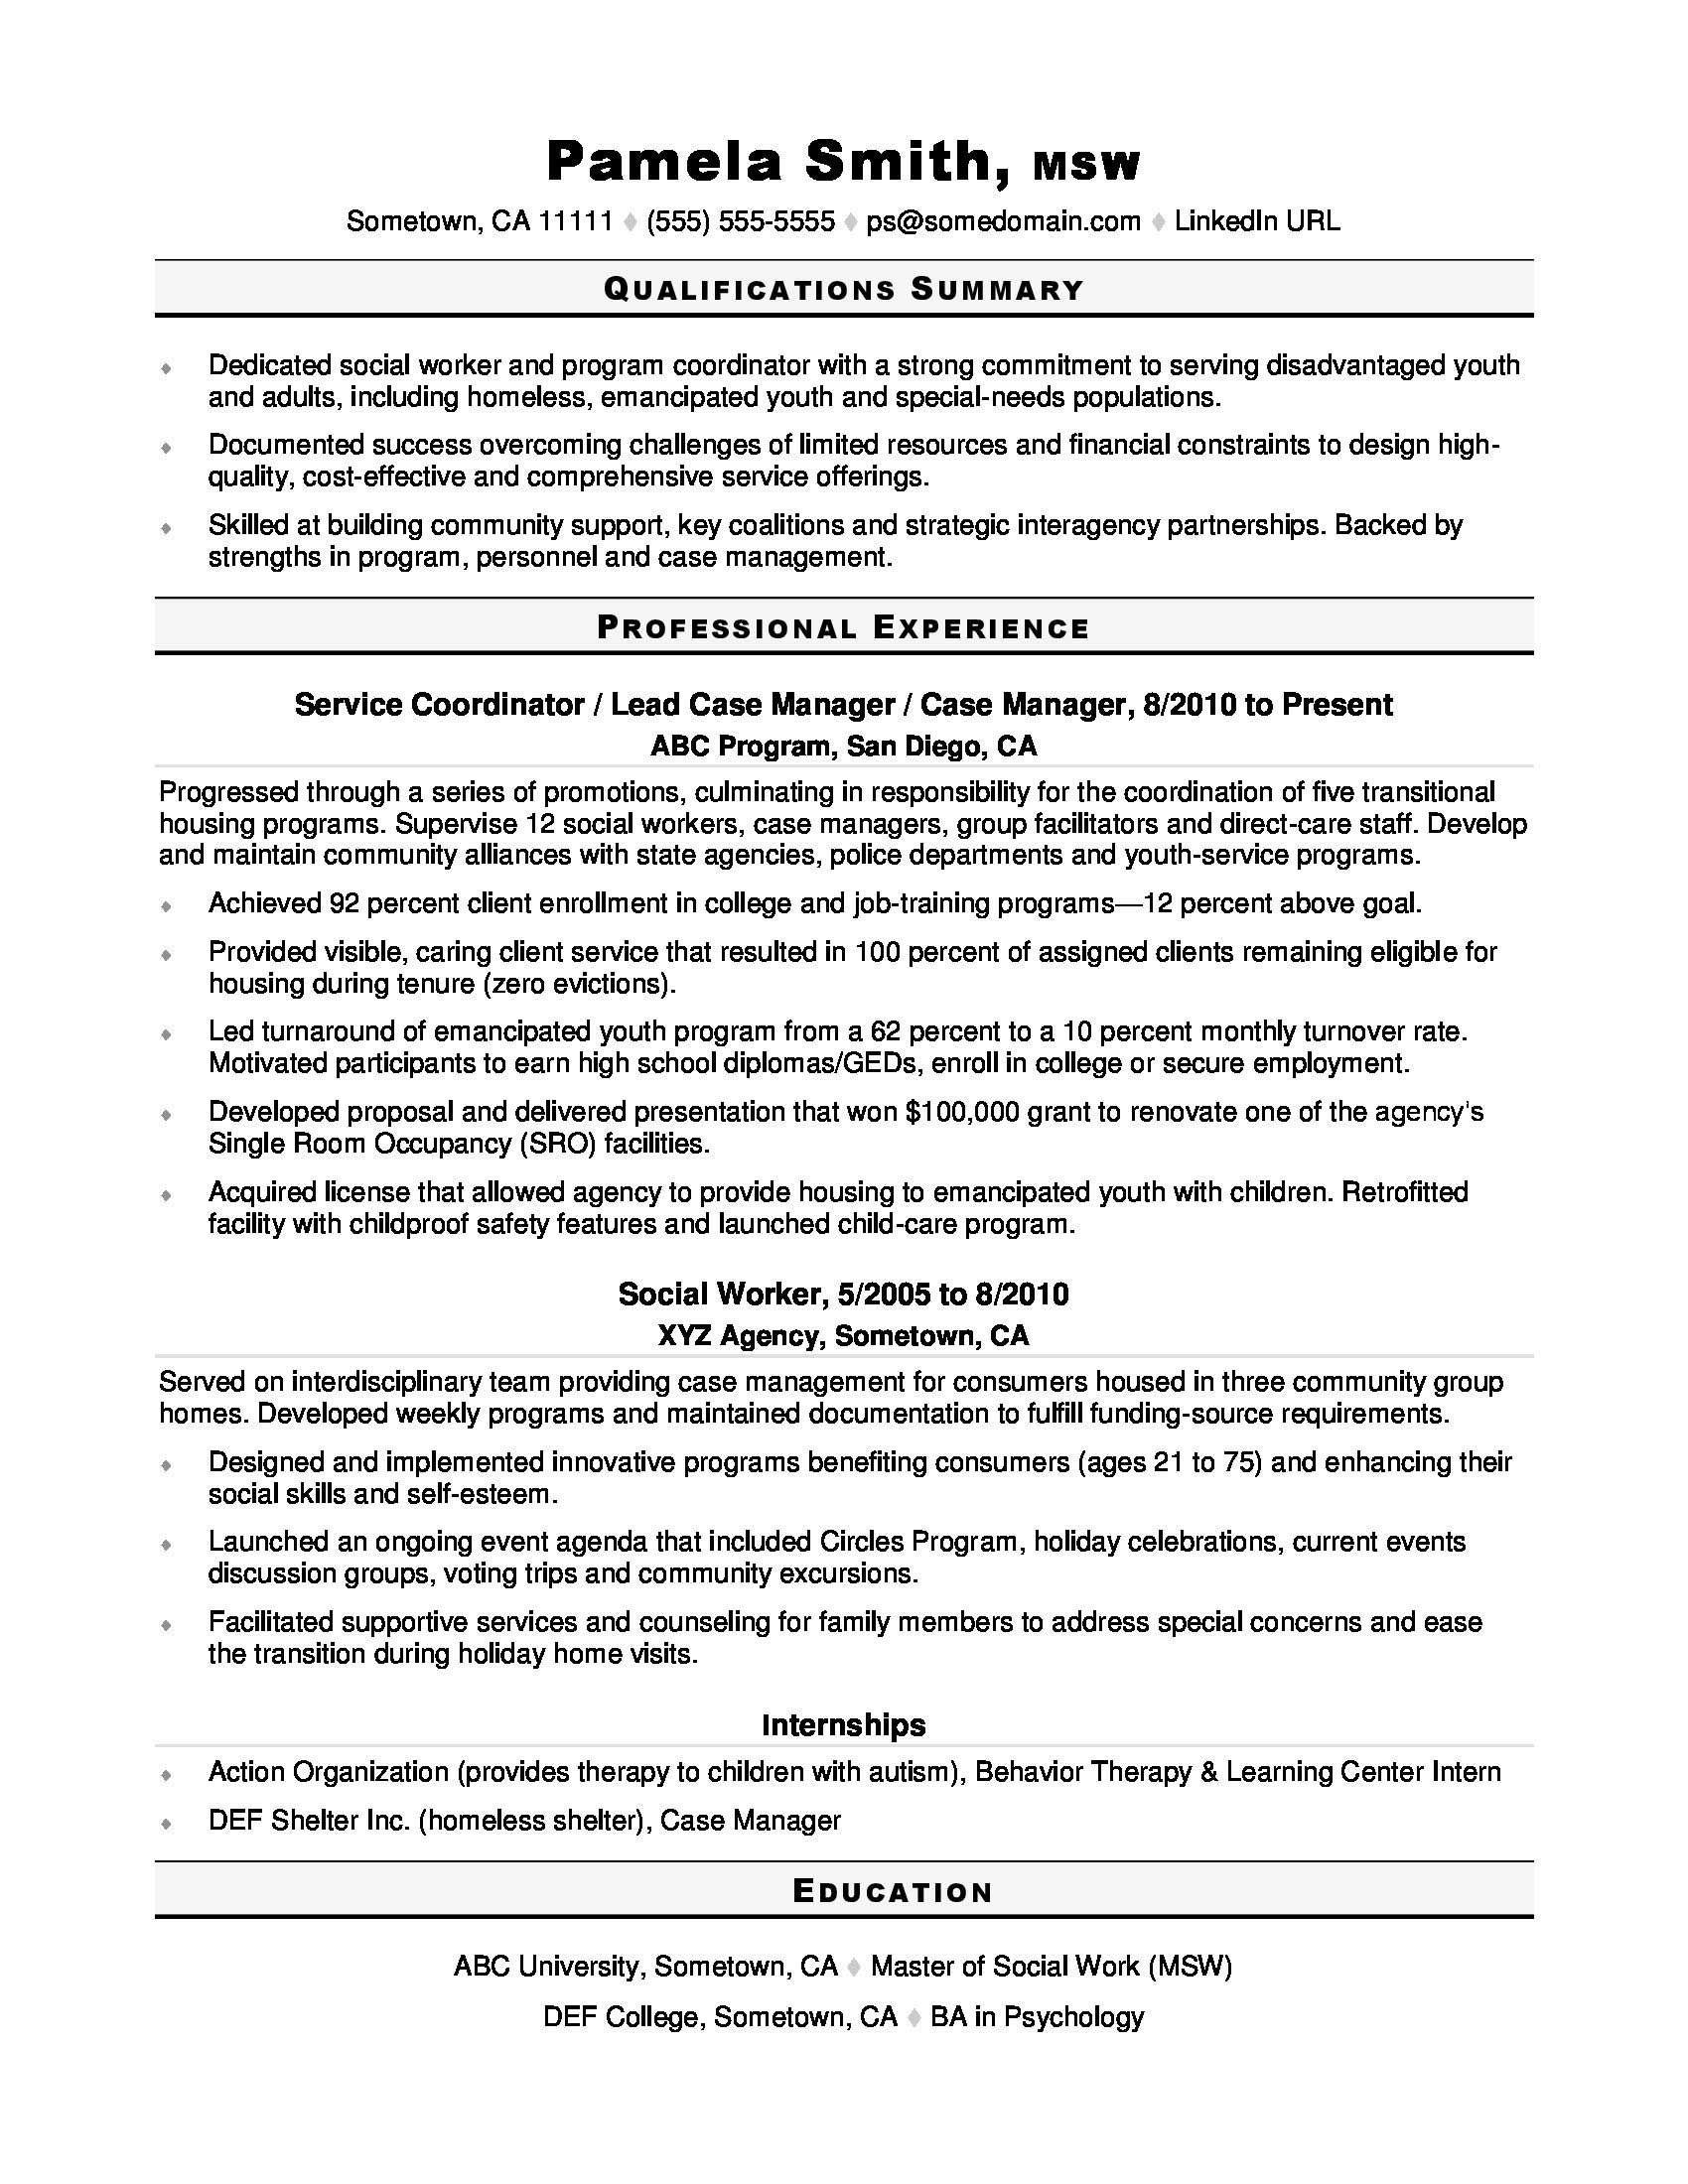 30 accounts payable resume objective resume objective